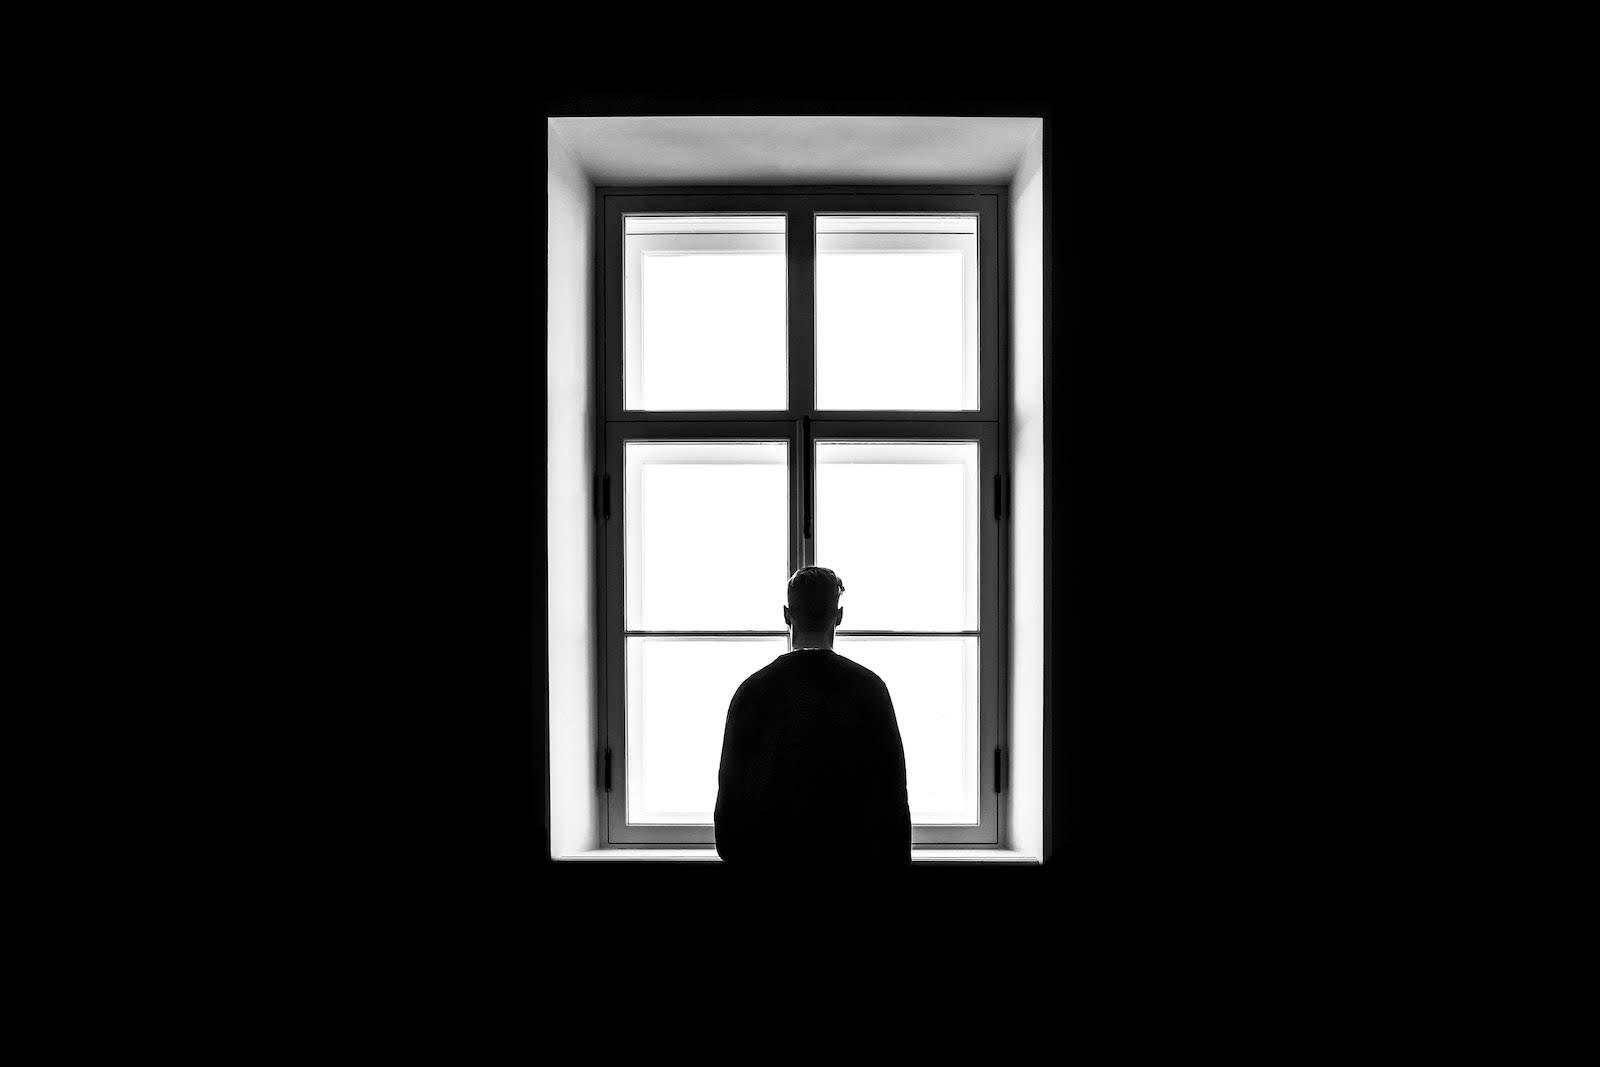 #959 Desde la ventana | luisbermejo.com | podcast